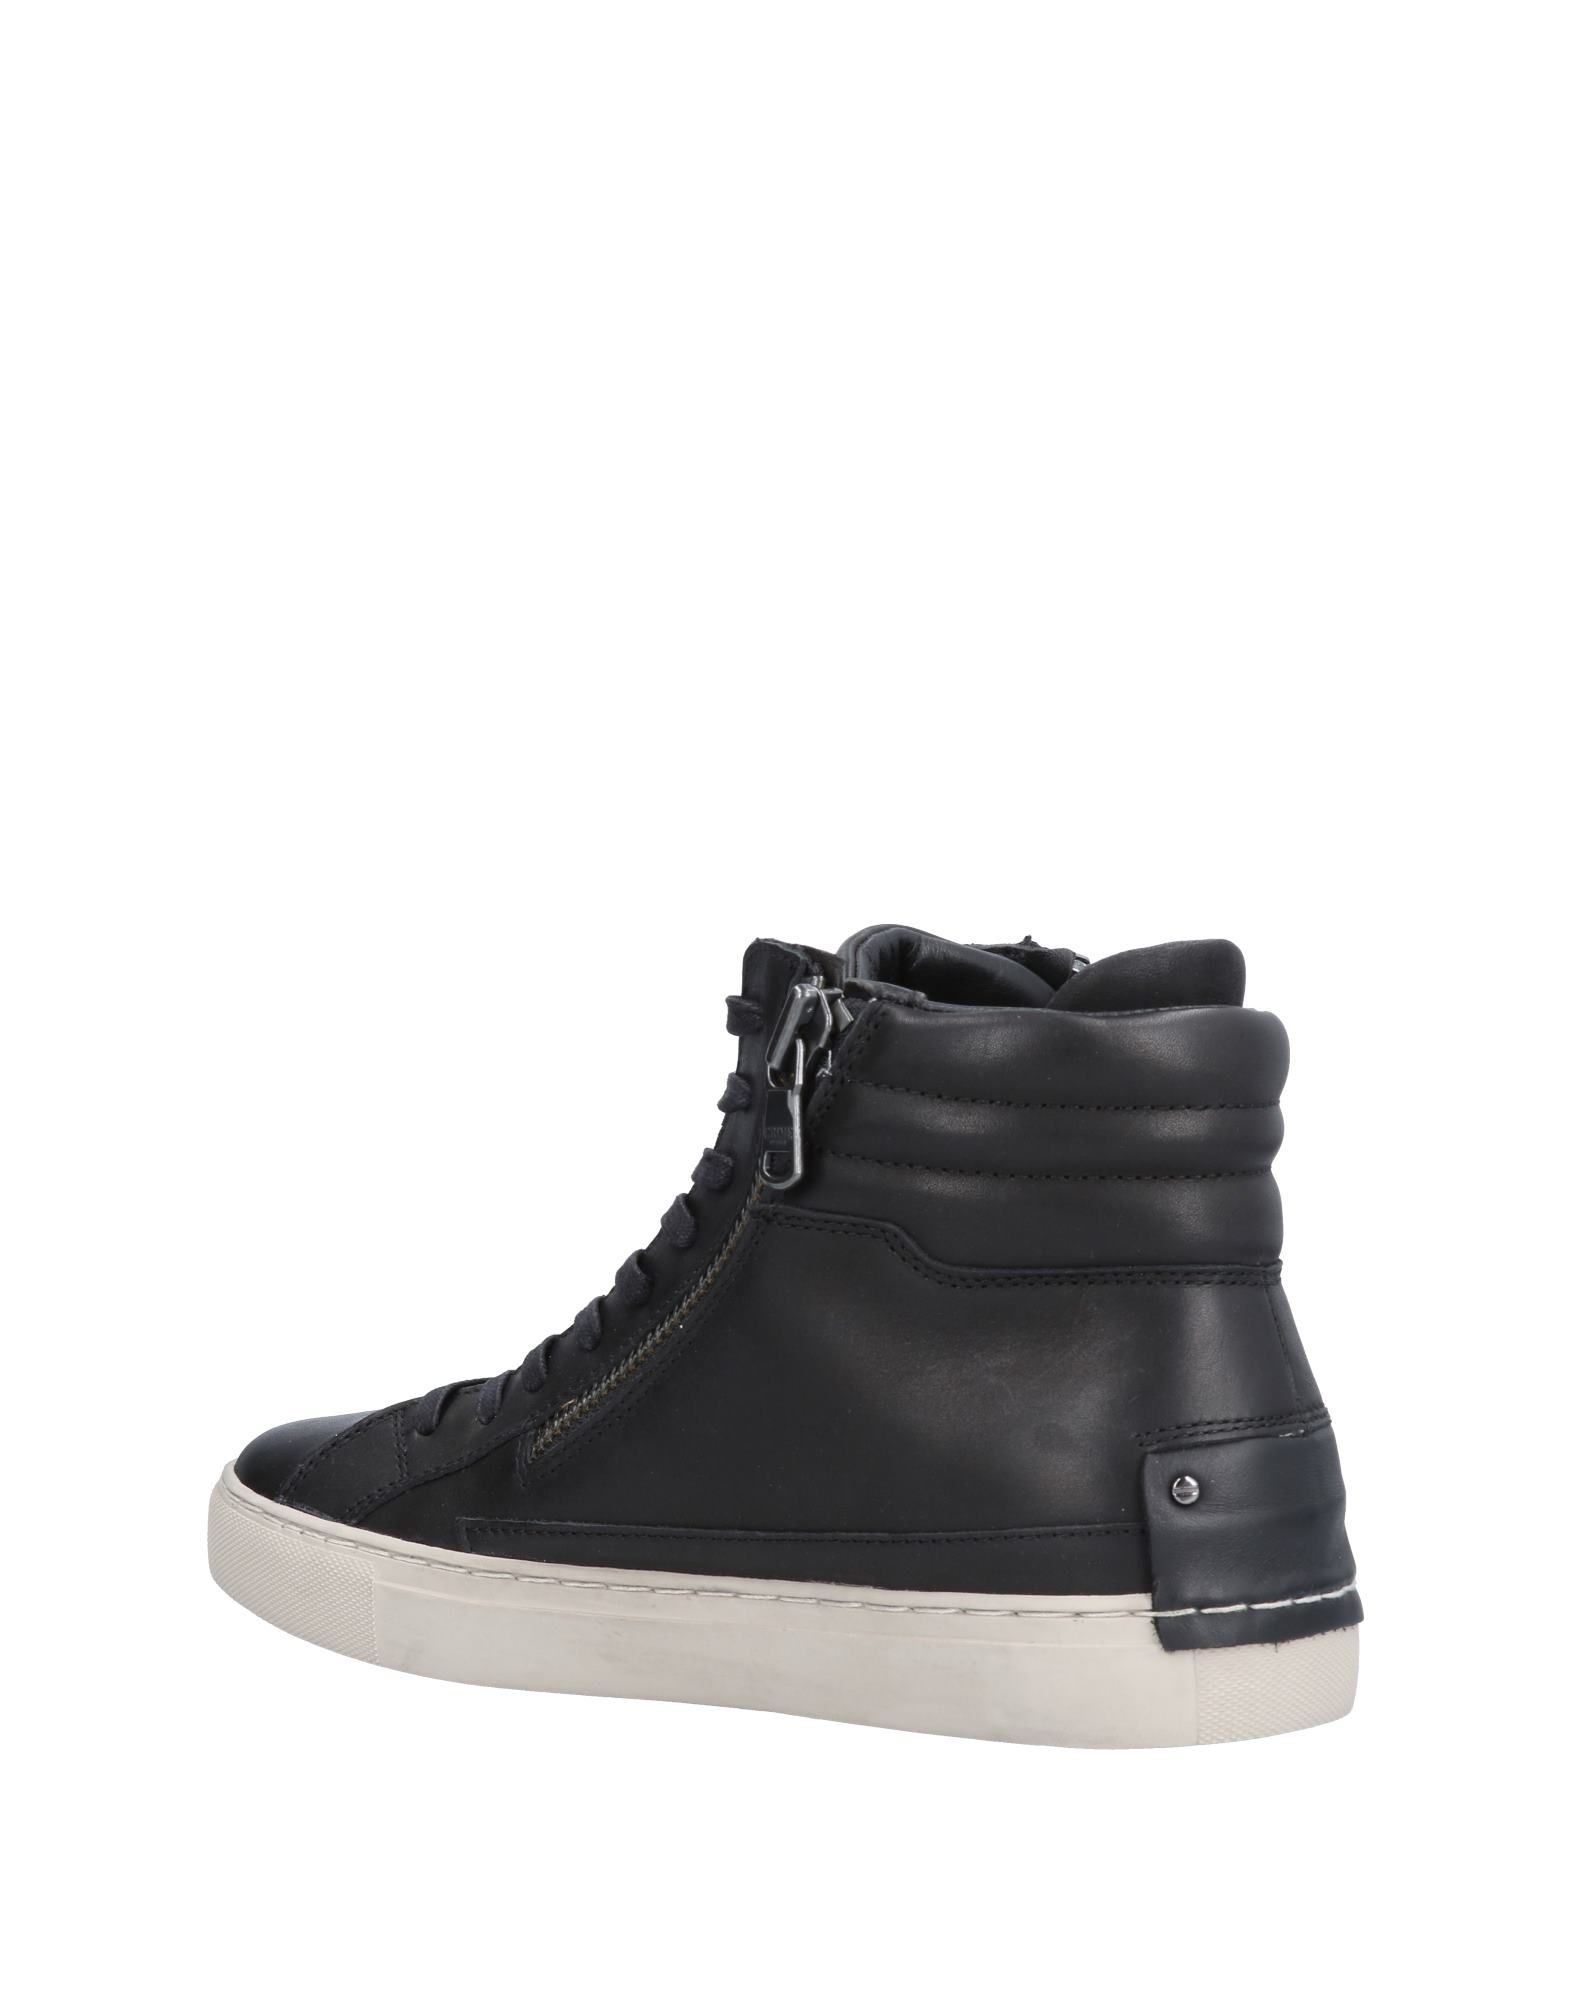 Crime Crime Crime London Sneakers Herren Gutes Preis-Leistungs-Verhältnis, es lohnt sich 010236